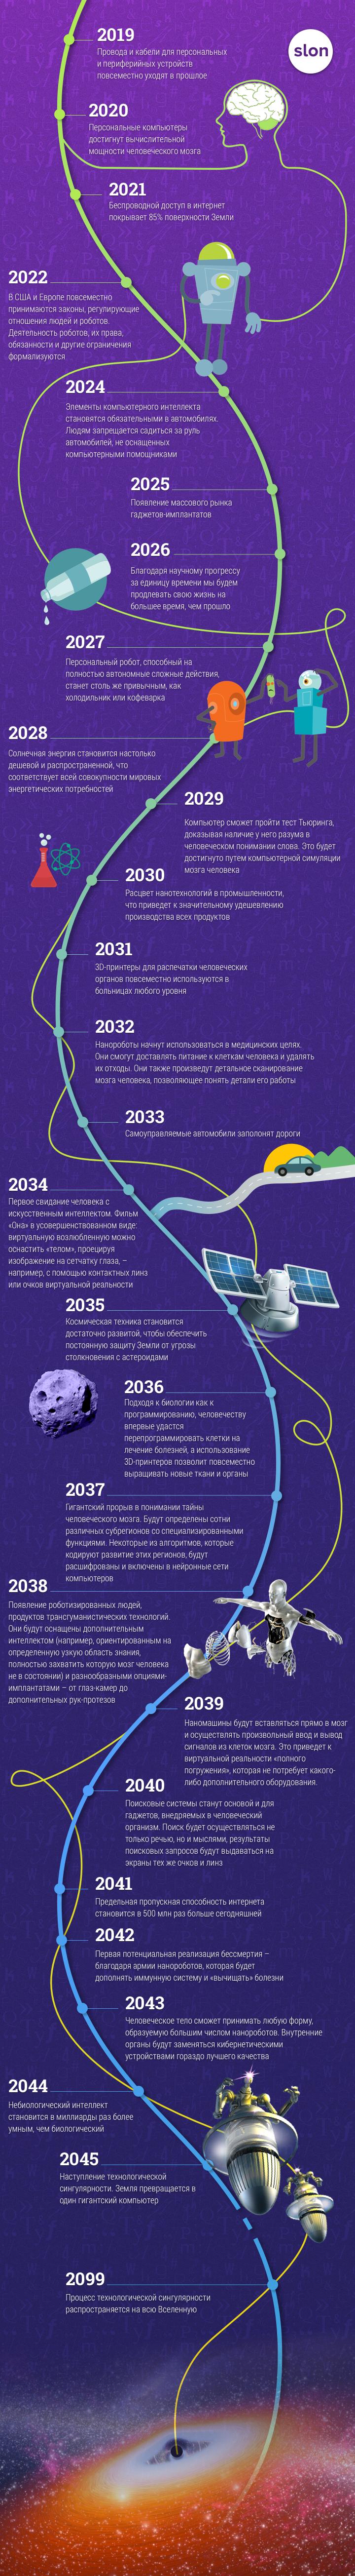 742585_original Прогноз развития технологий до конца XXI века Анализ - прогноз